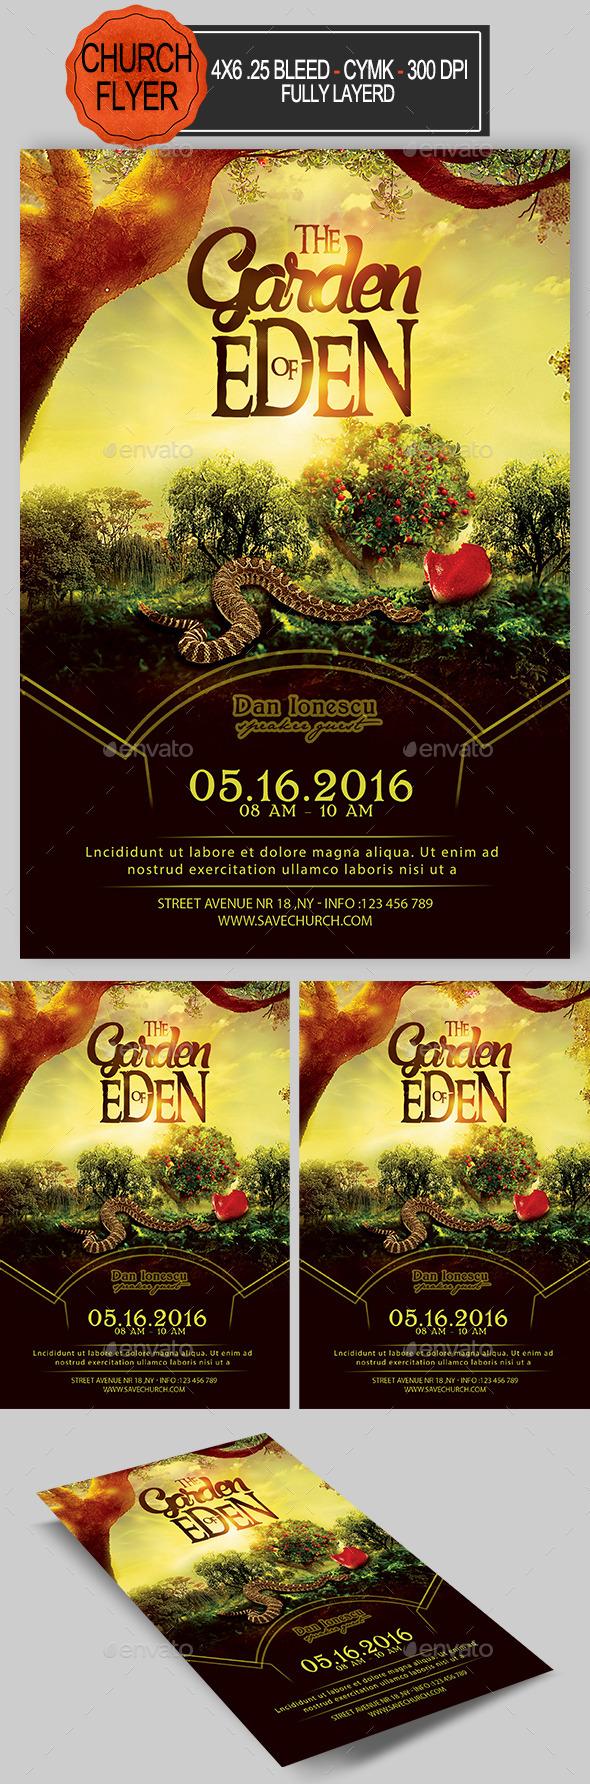 The Garden Of Eden Church Flyer  - Church Flyers